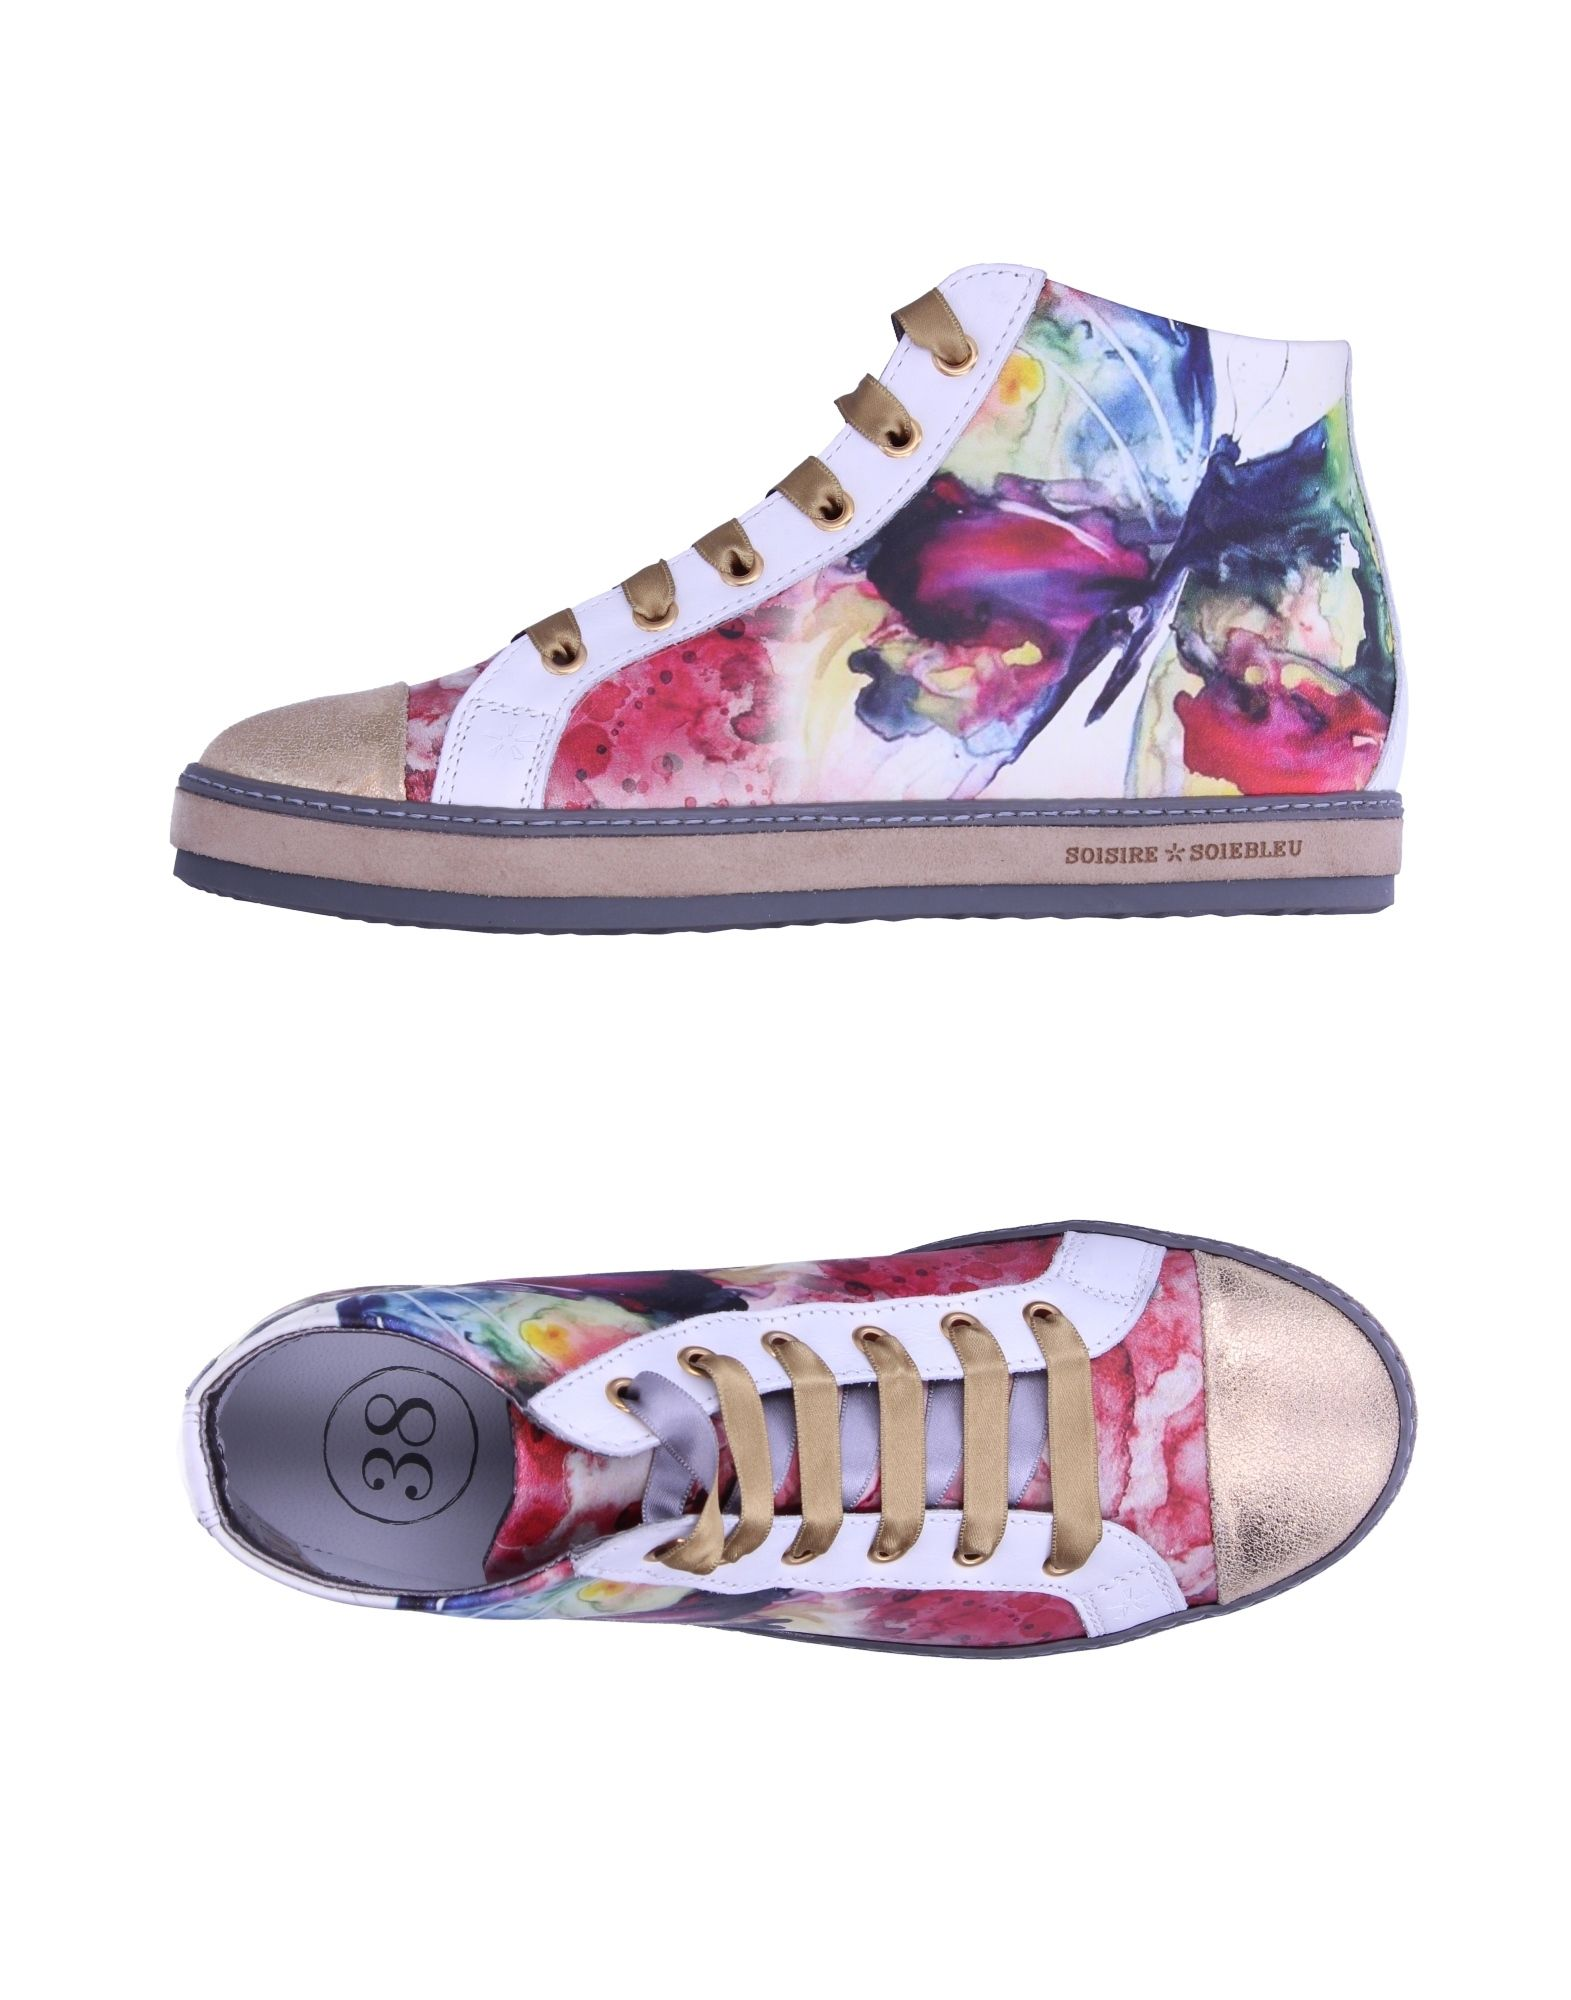 Sneakers Soisire Soiebleu Donna - 11193552TS